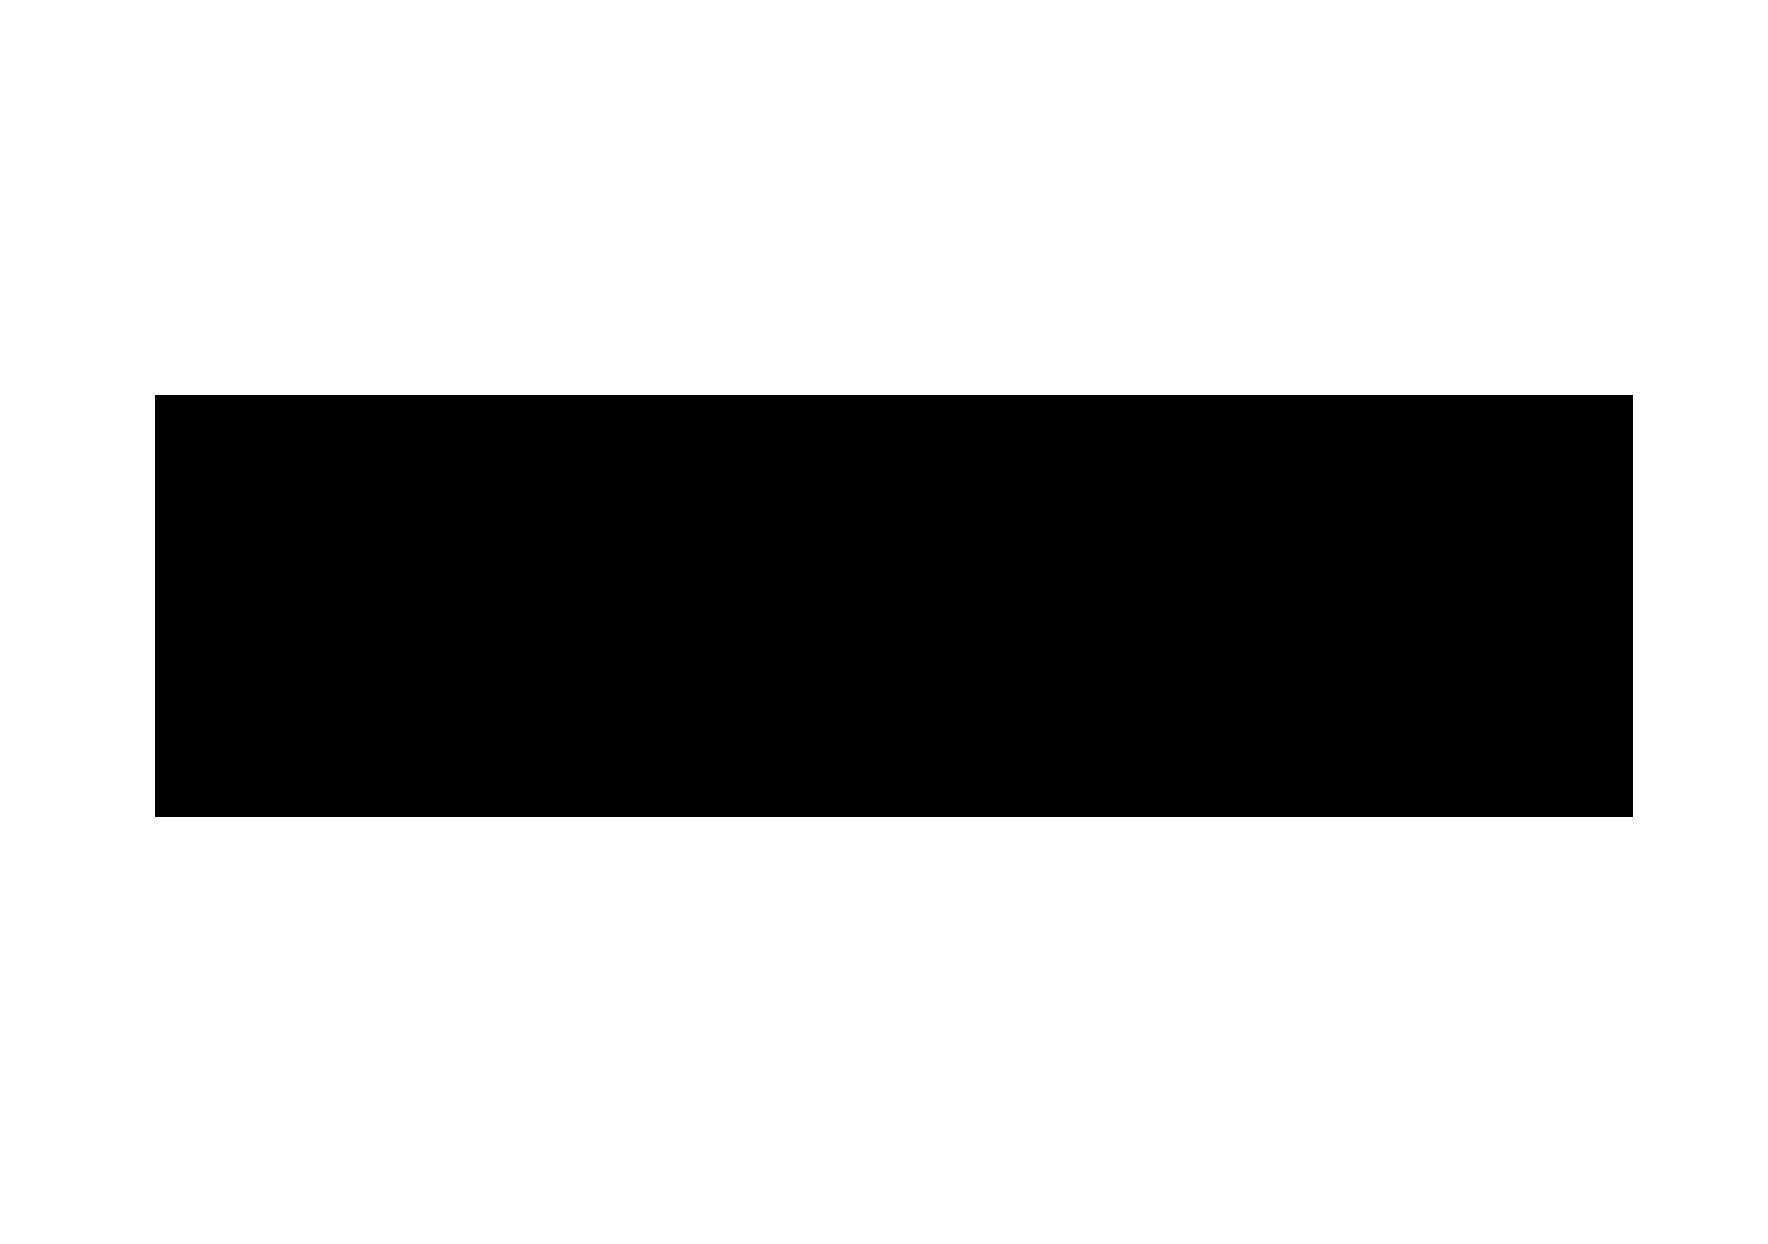 مخطوطه رمضان كريم مفرغه 9 15 مخطوطه لشهر رمضان بالخط الحر png